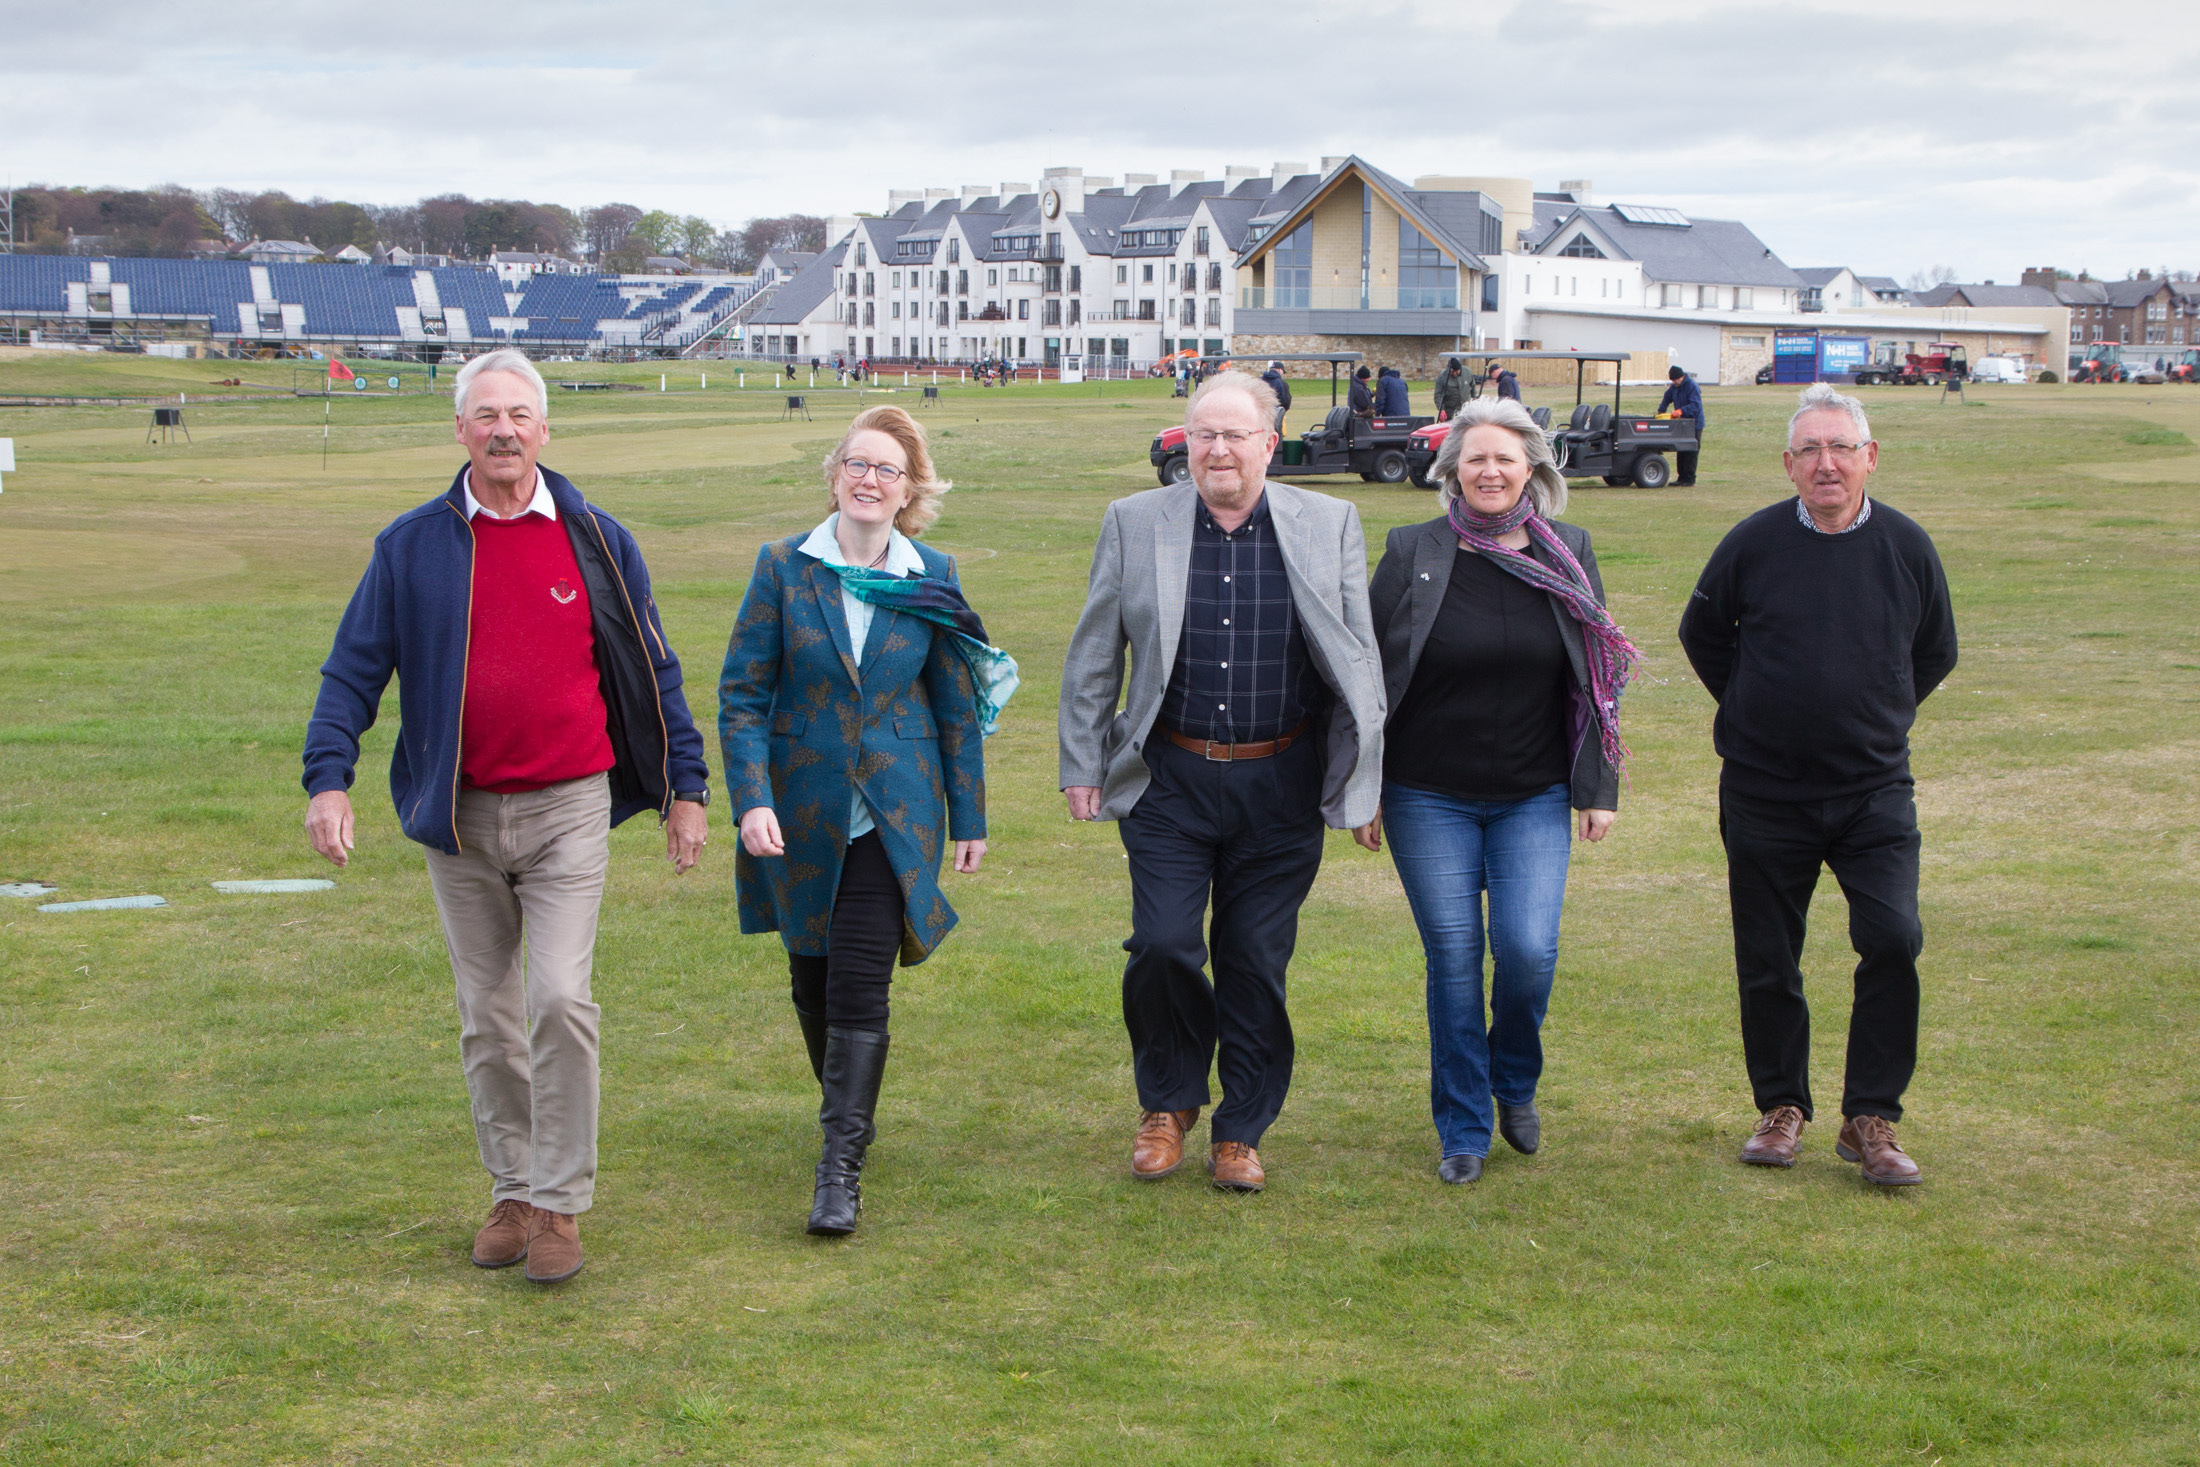 Members of Carnoustie Community Development Trust at Carnoustie Golf Links. L to R: Neil Watson, Suzi Caesar, Derek Miller, Pauline Lockhart and Ed Oswald.